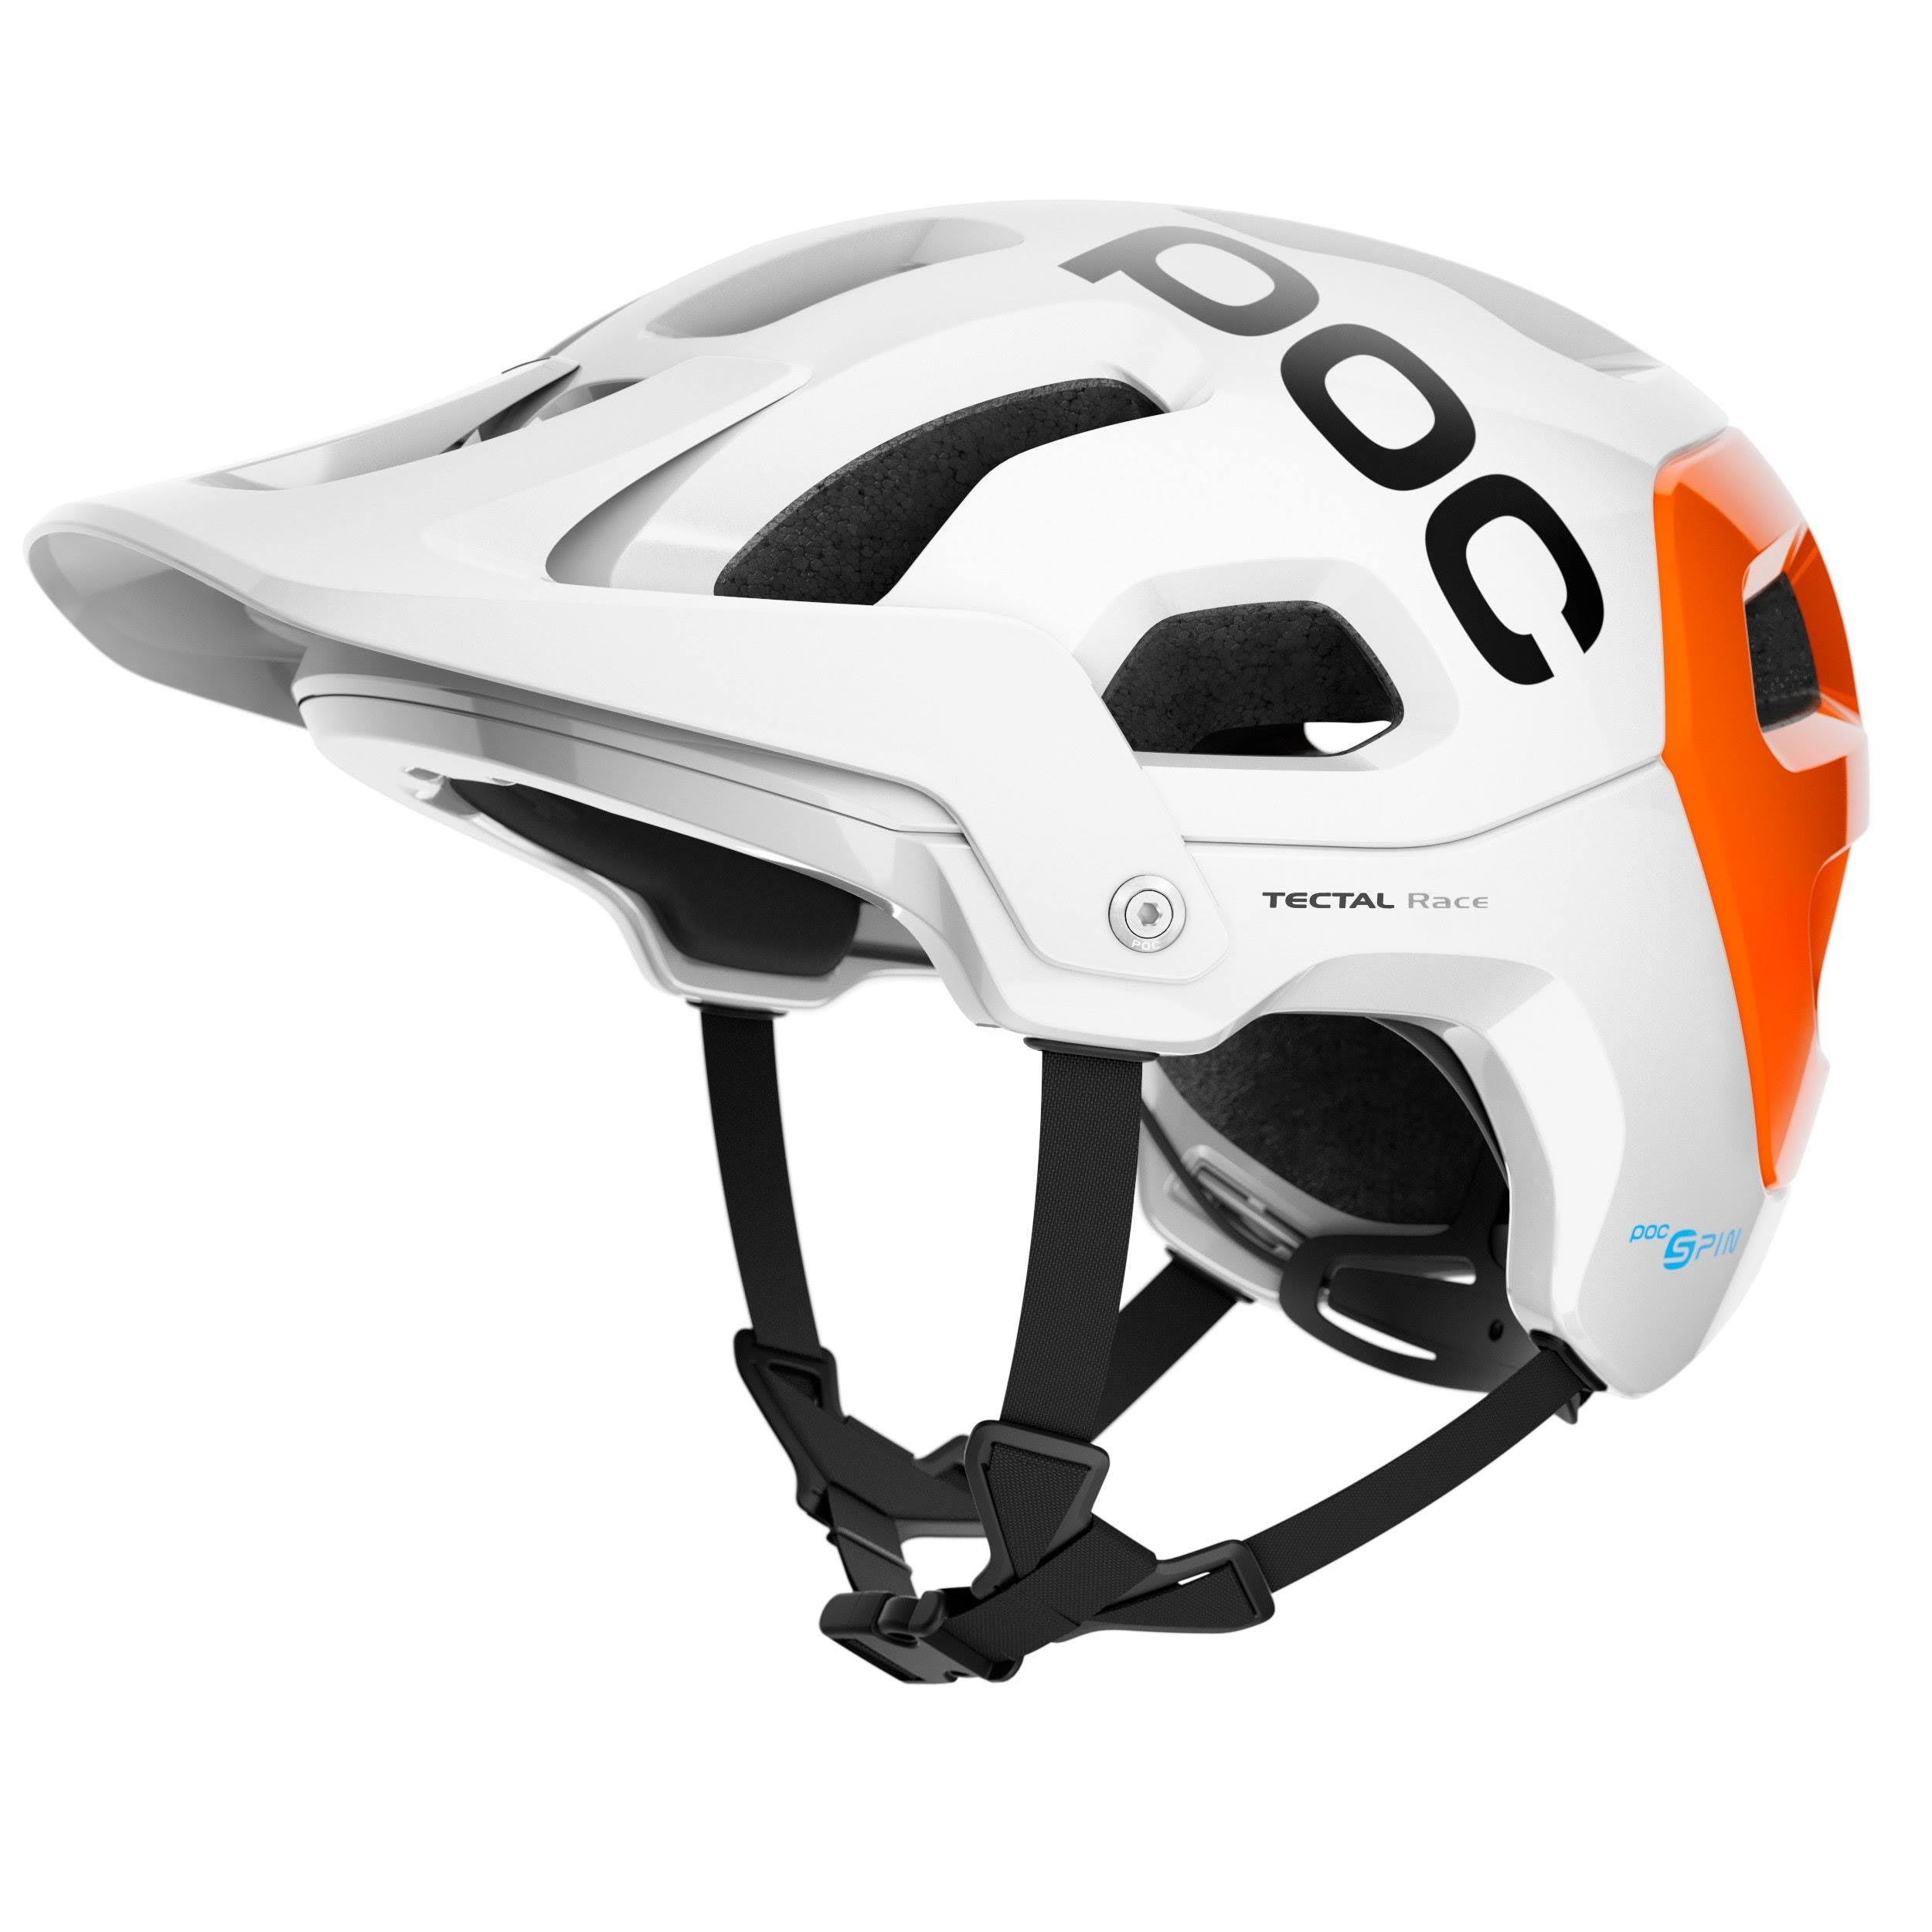 POC Tectal Race Spin NFC Helmet Hydrogen White/Fluorescent Orange Avip, XS/S